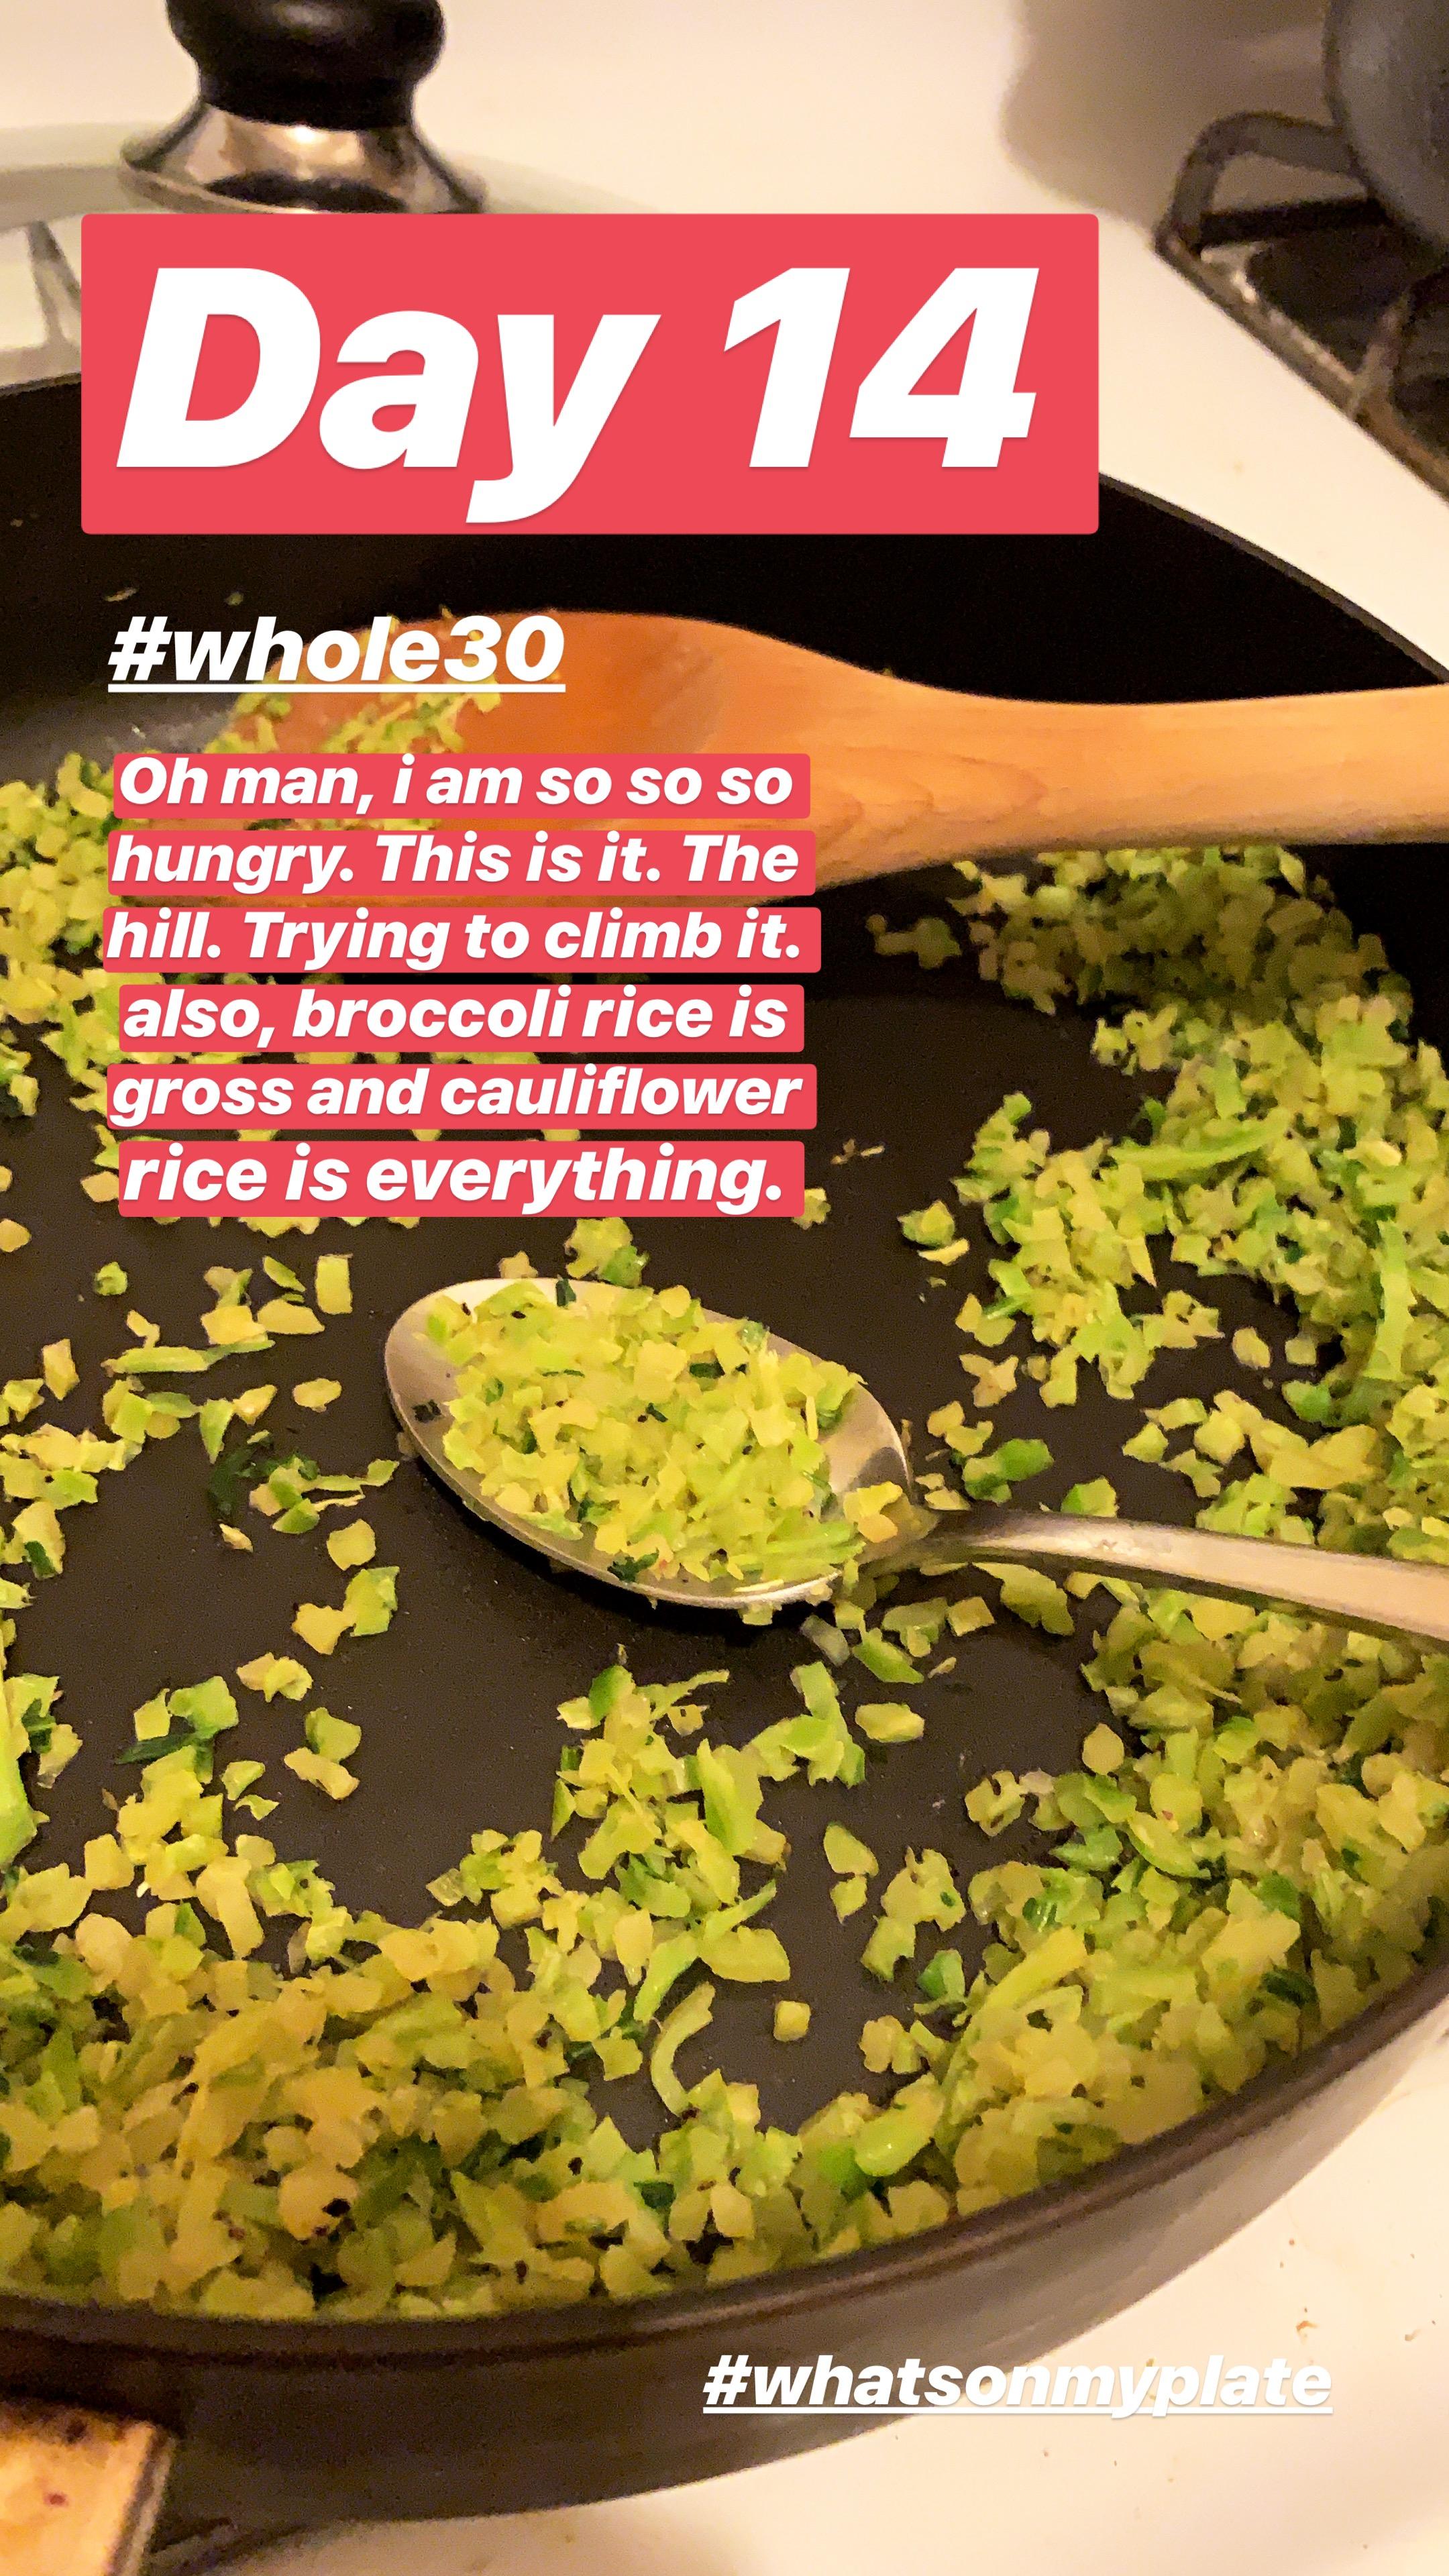 whole30 challenge cynthia chung food lifestyle change0027.JPG